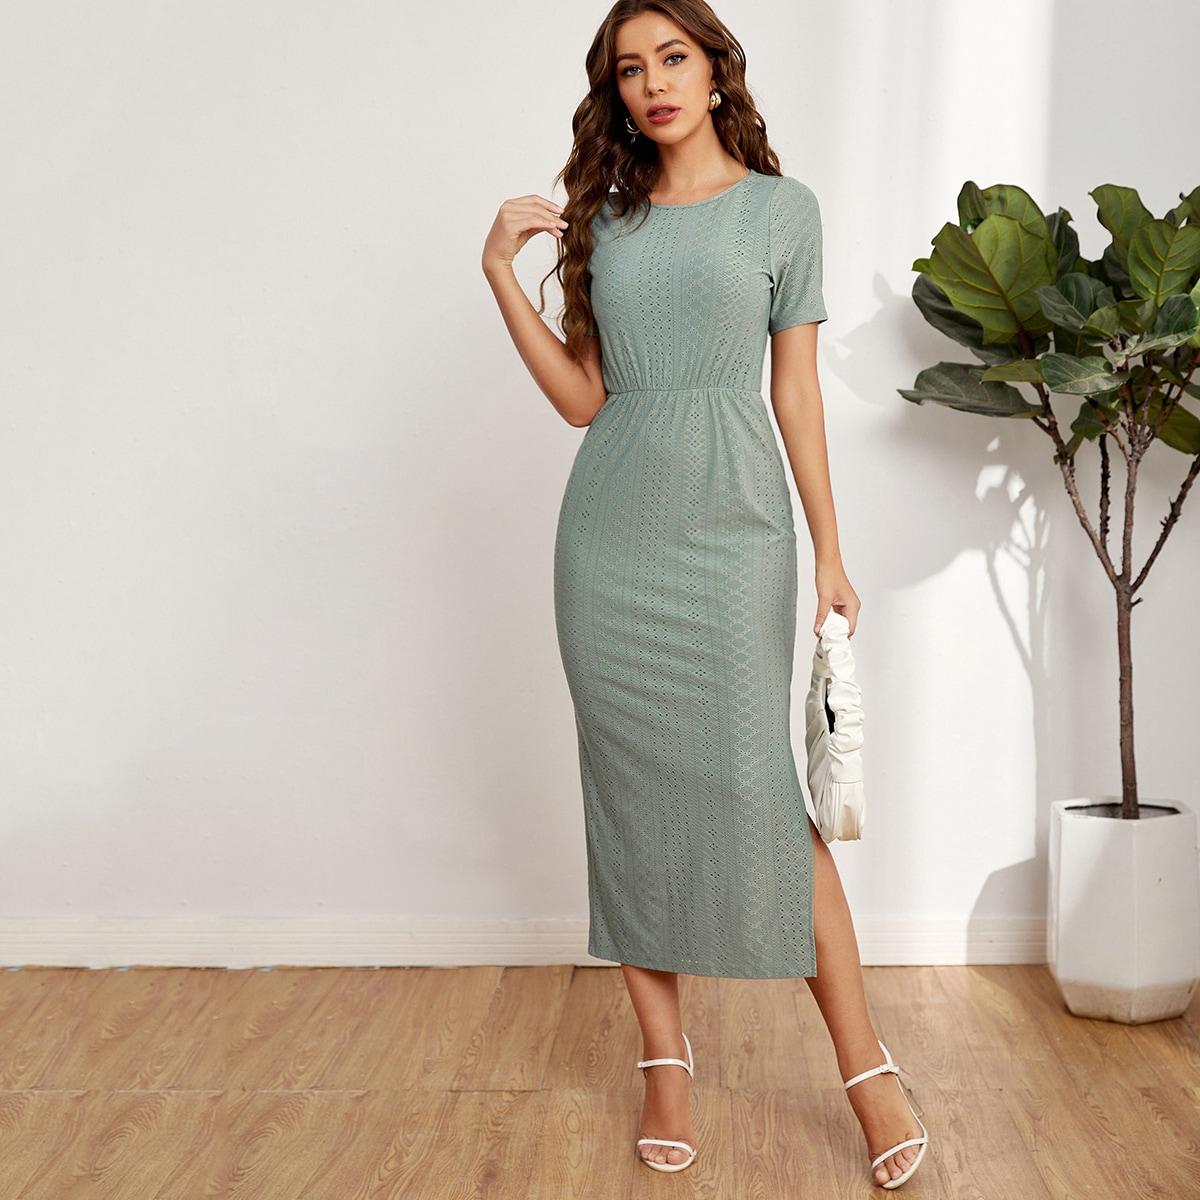 Вязаное платье с разрезом SheIn swdress07210331475